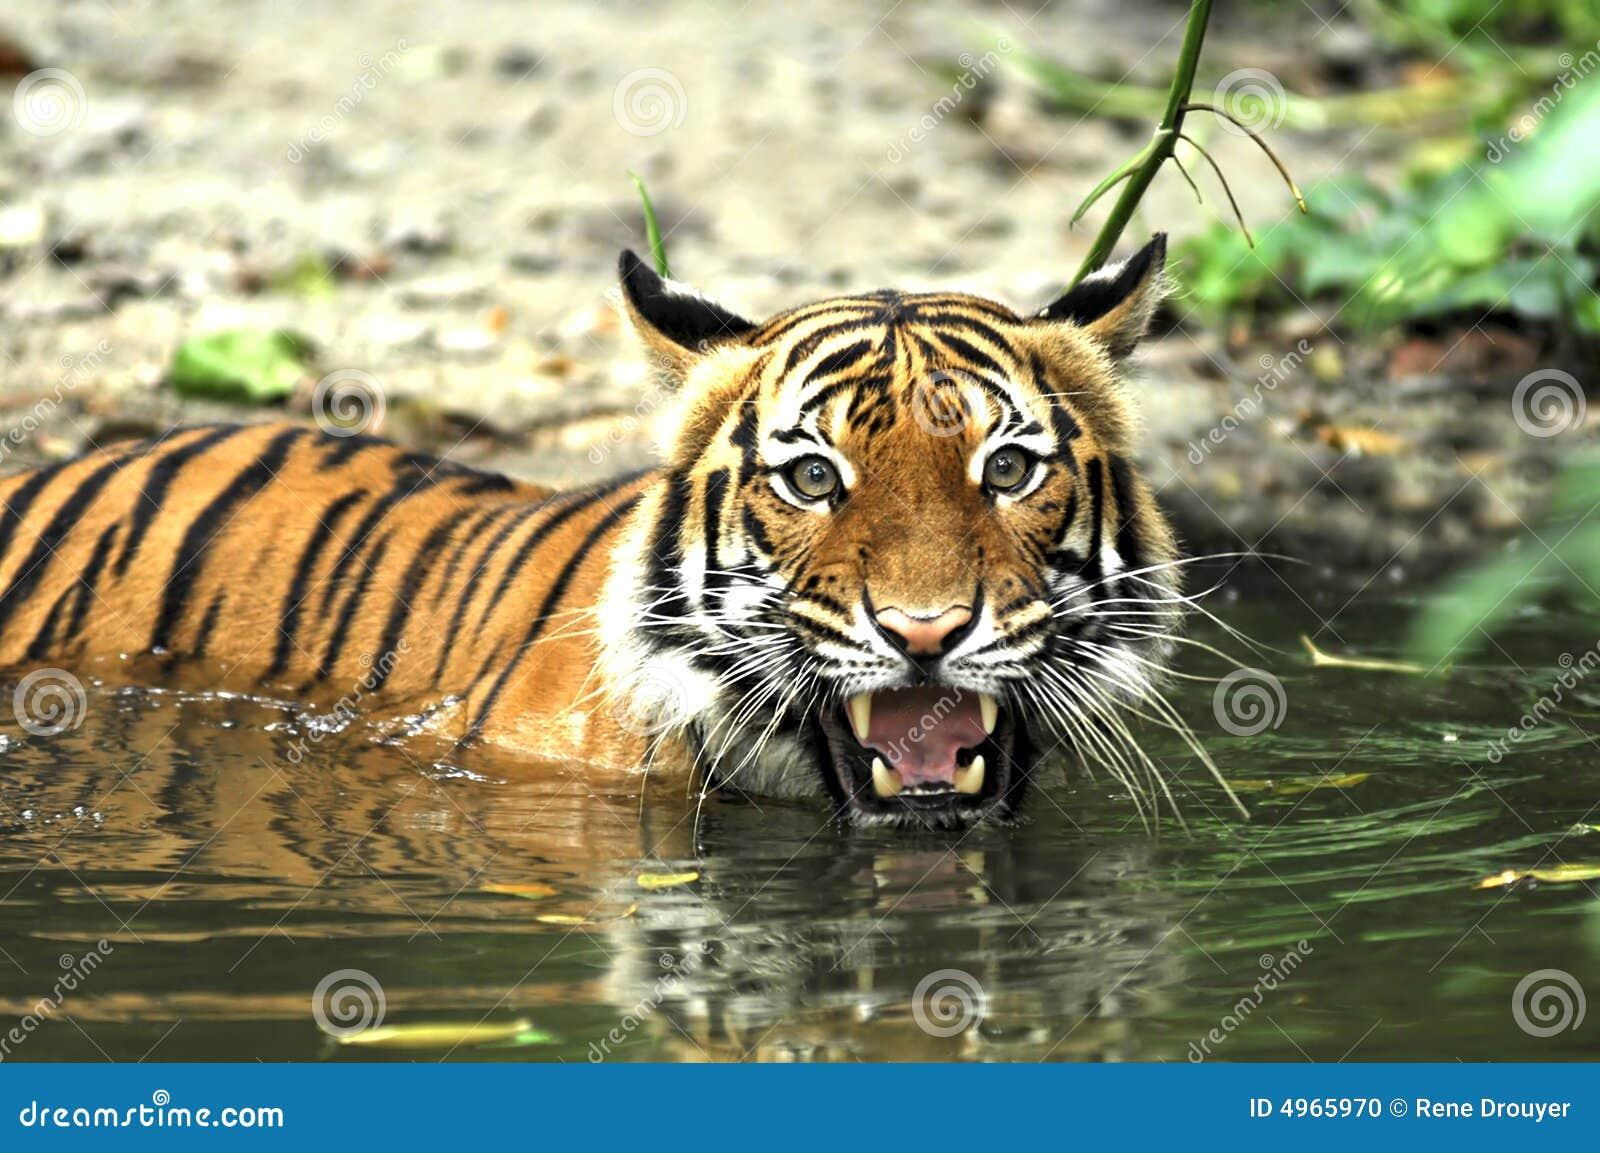 Indonesia; sumatra tiger